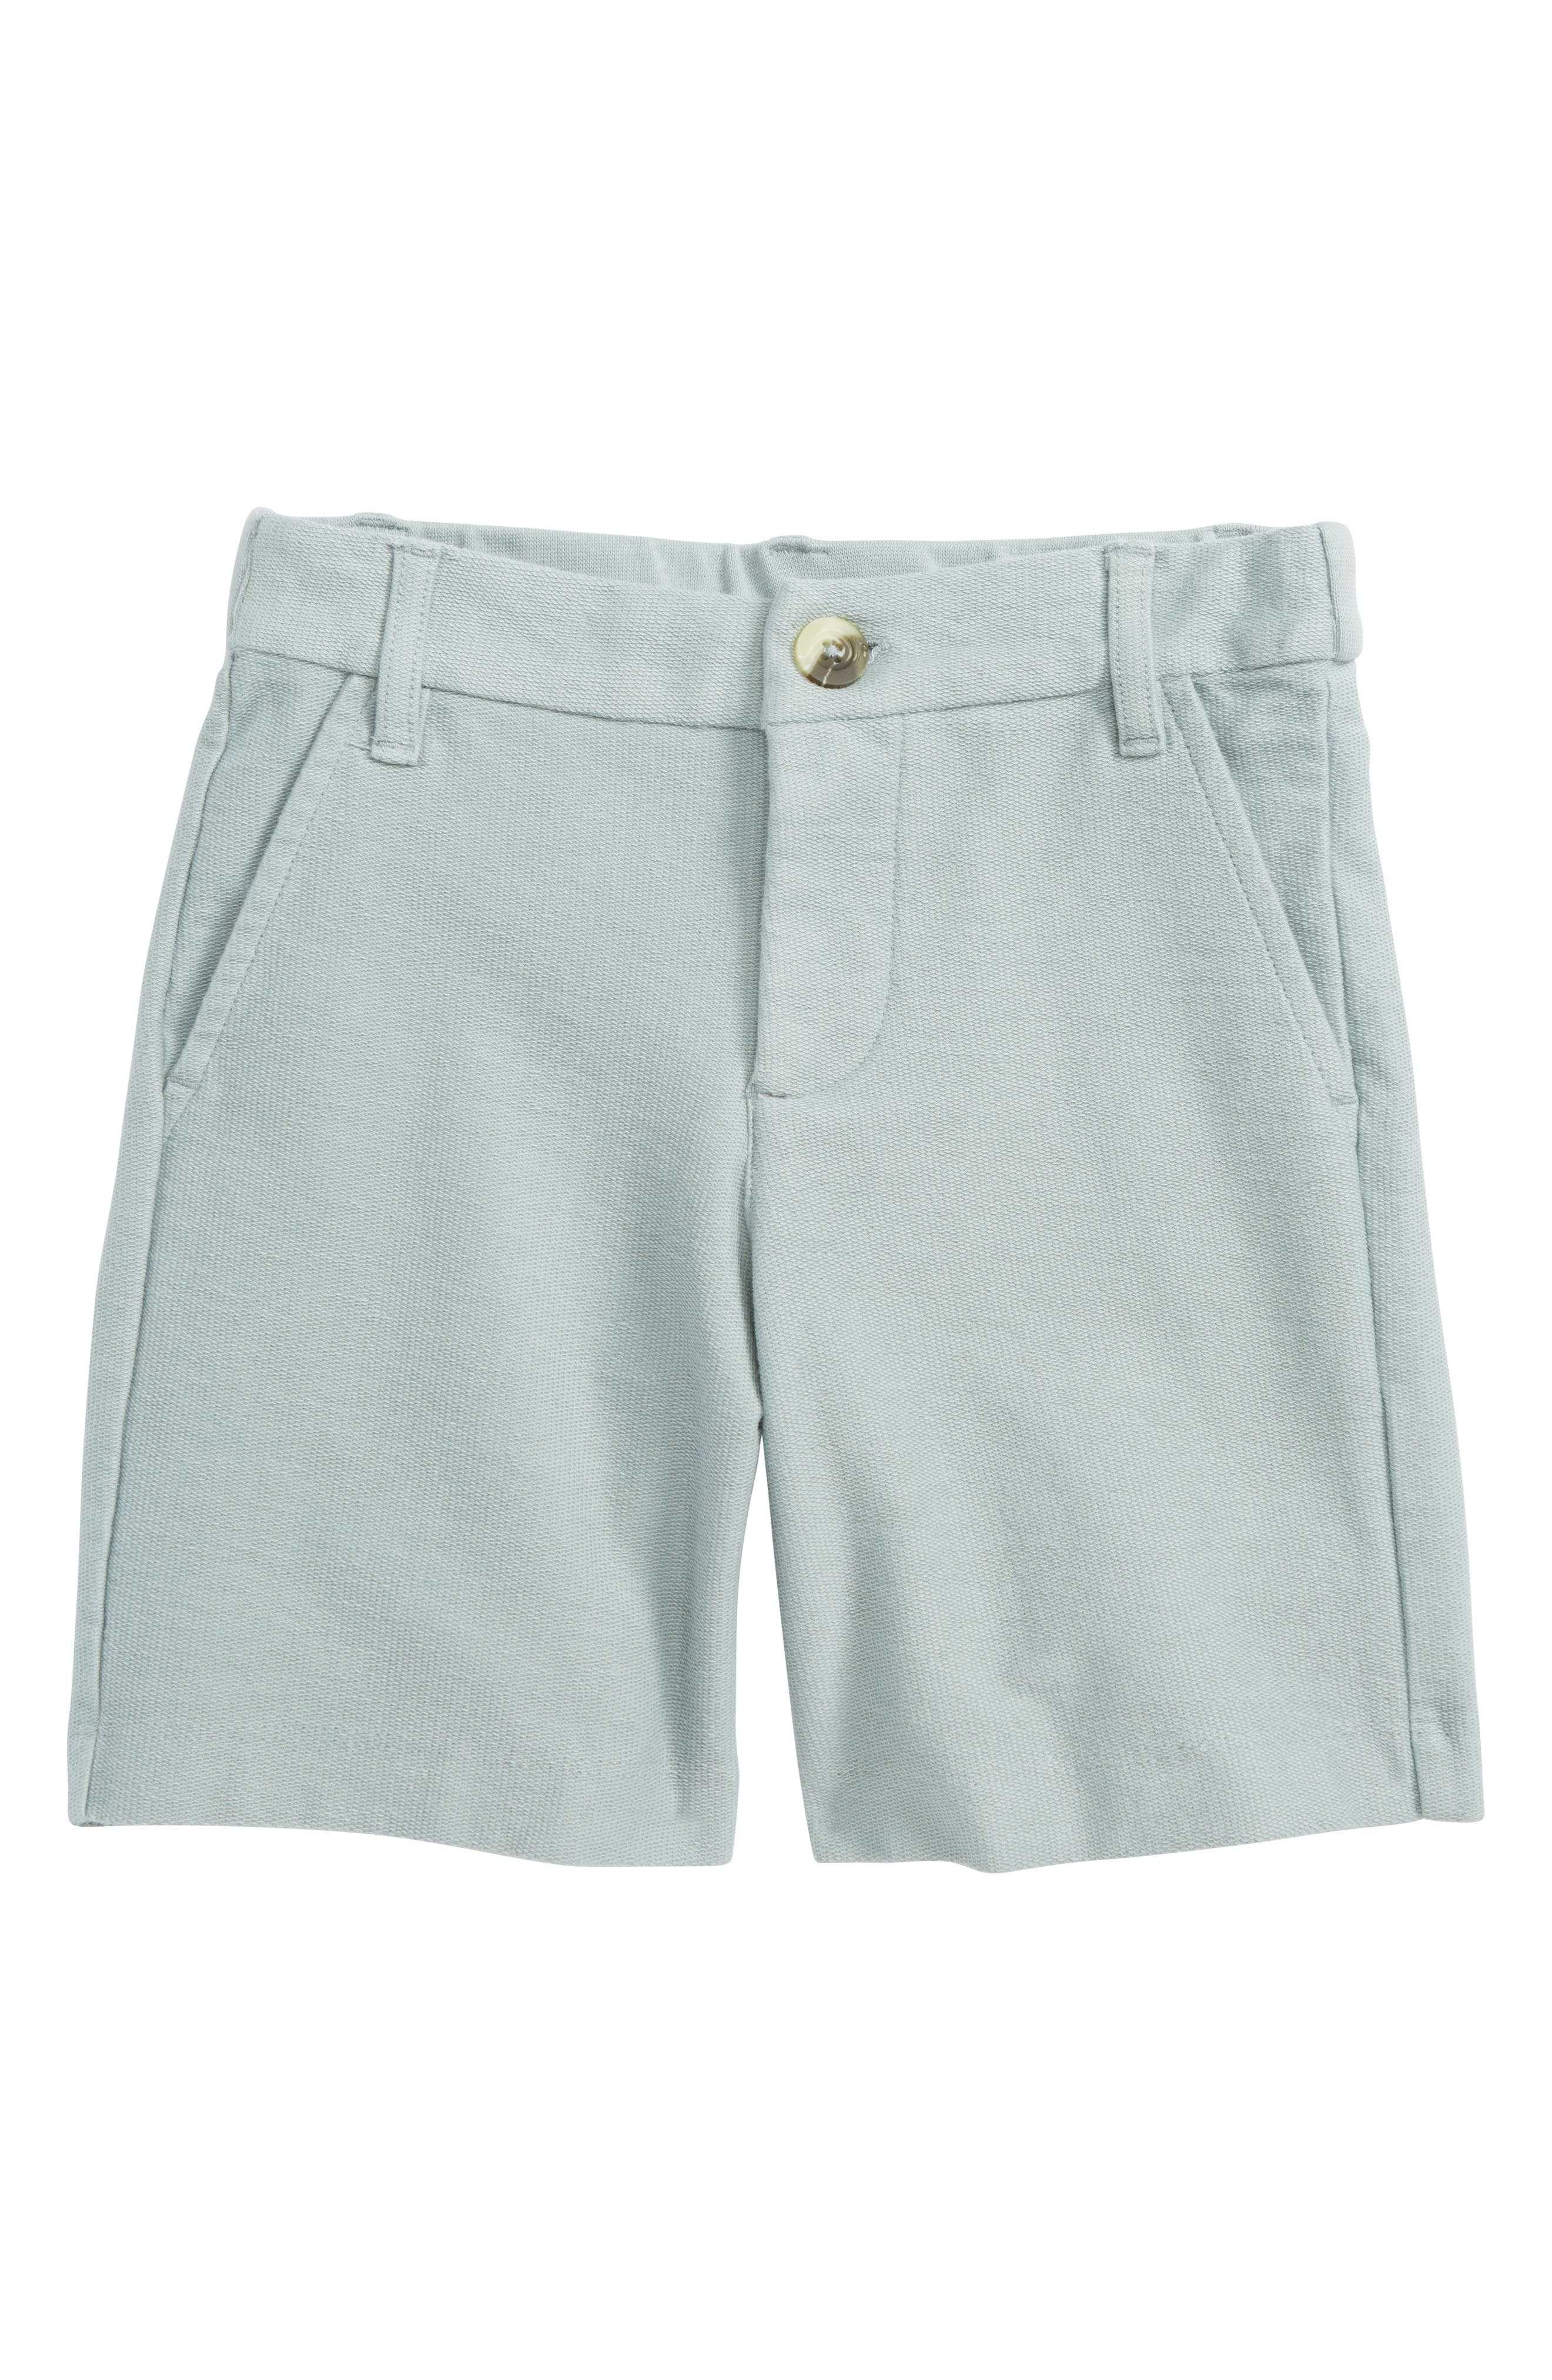 Main Image - Peek Easton Shorts (Toddler Boys, Little Boys & Big Boys)